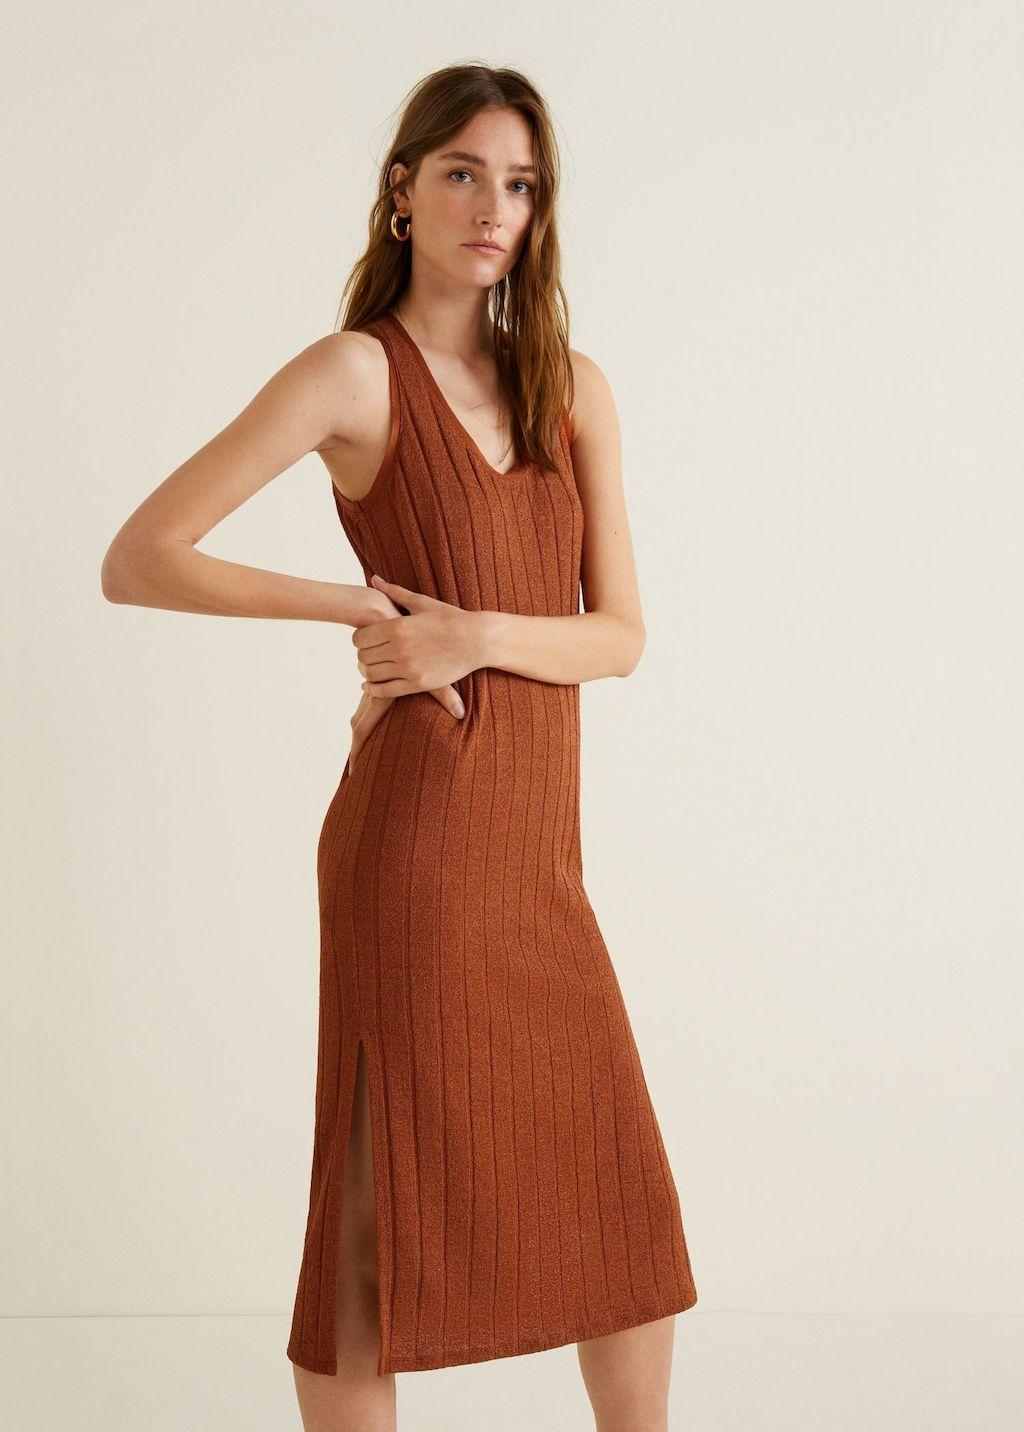 ef9b598c8e6337 Tricot jurk ribdetails - Dames